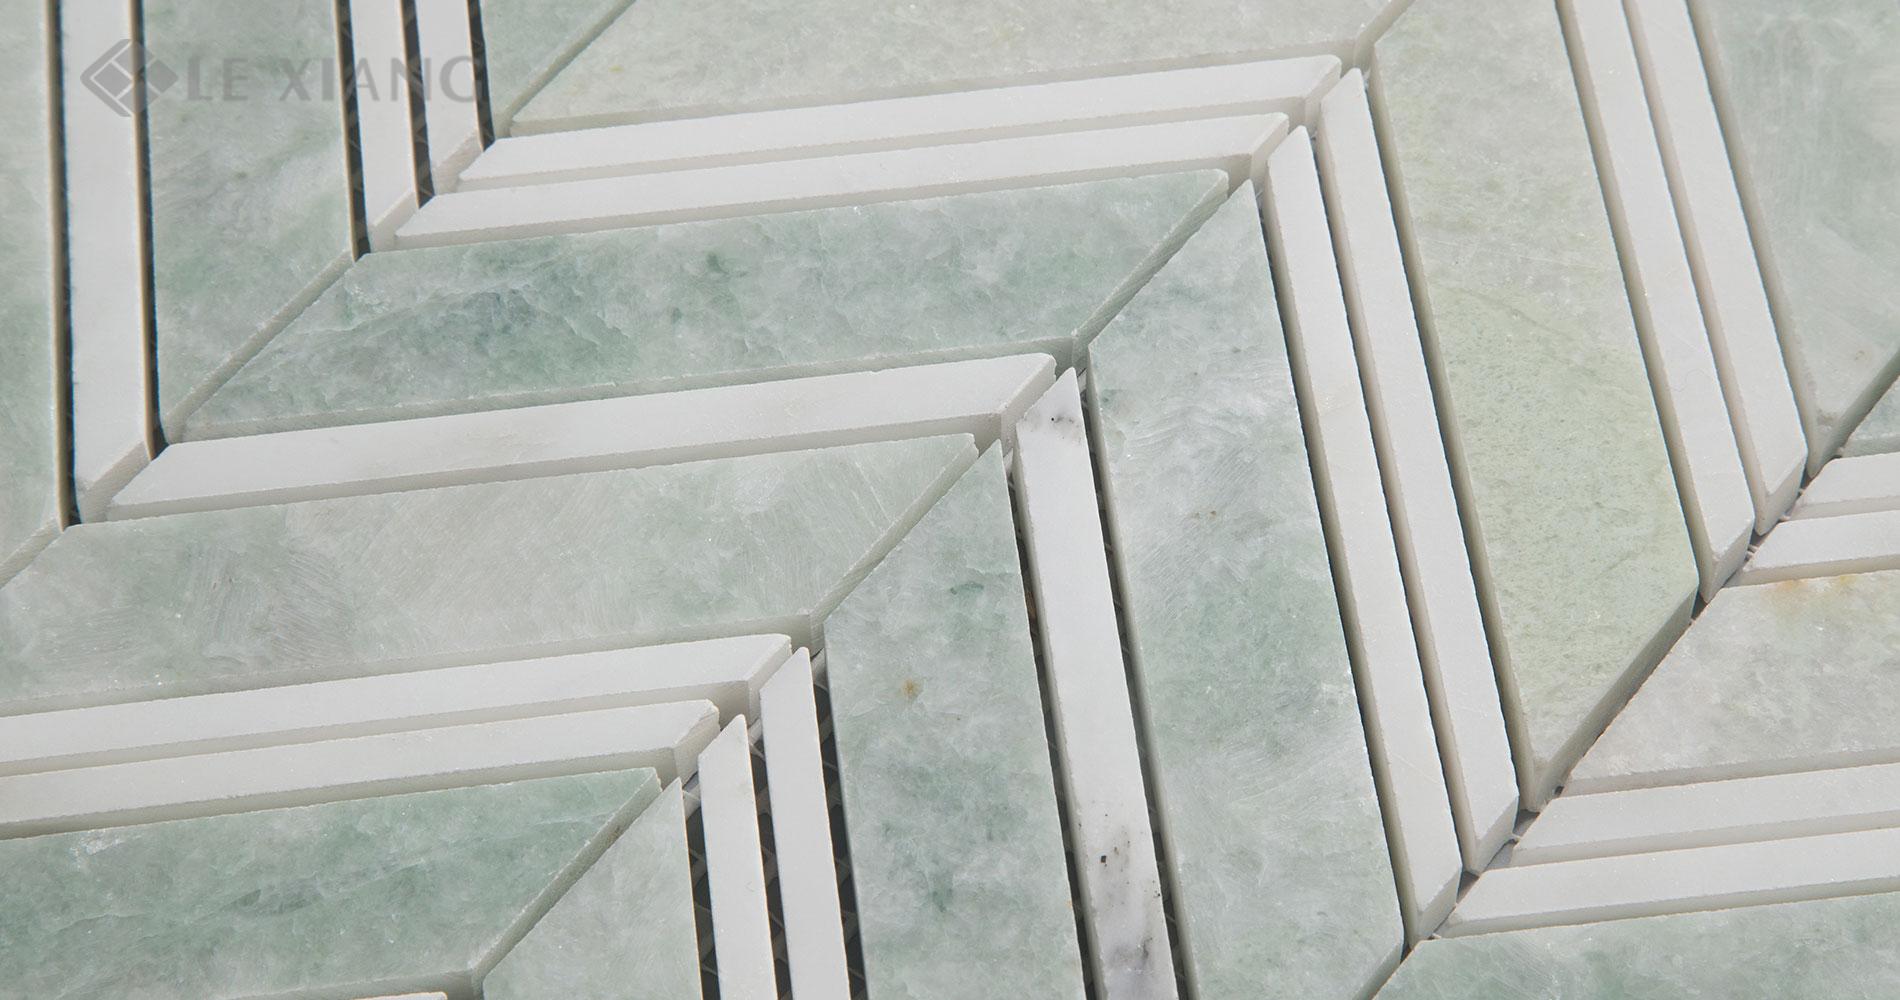 Chevron-Pattern-Marble-Mosaic-Tile-Bothroom-Floors-Kitchen-Backsplash-1-6